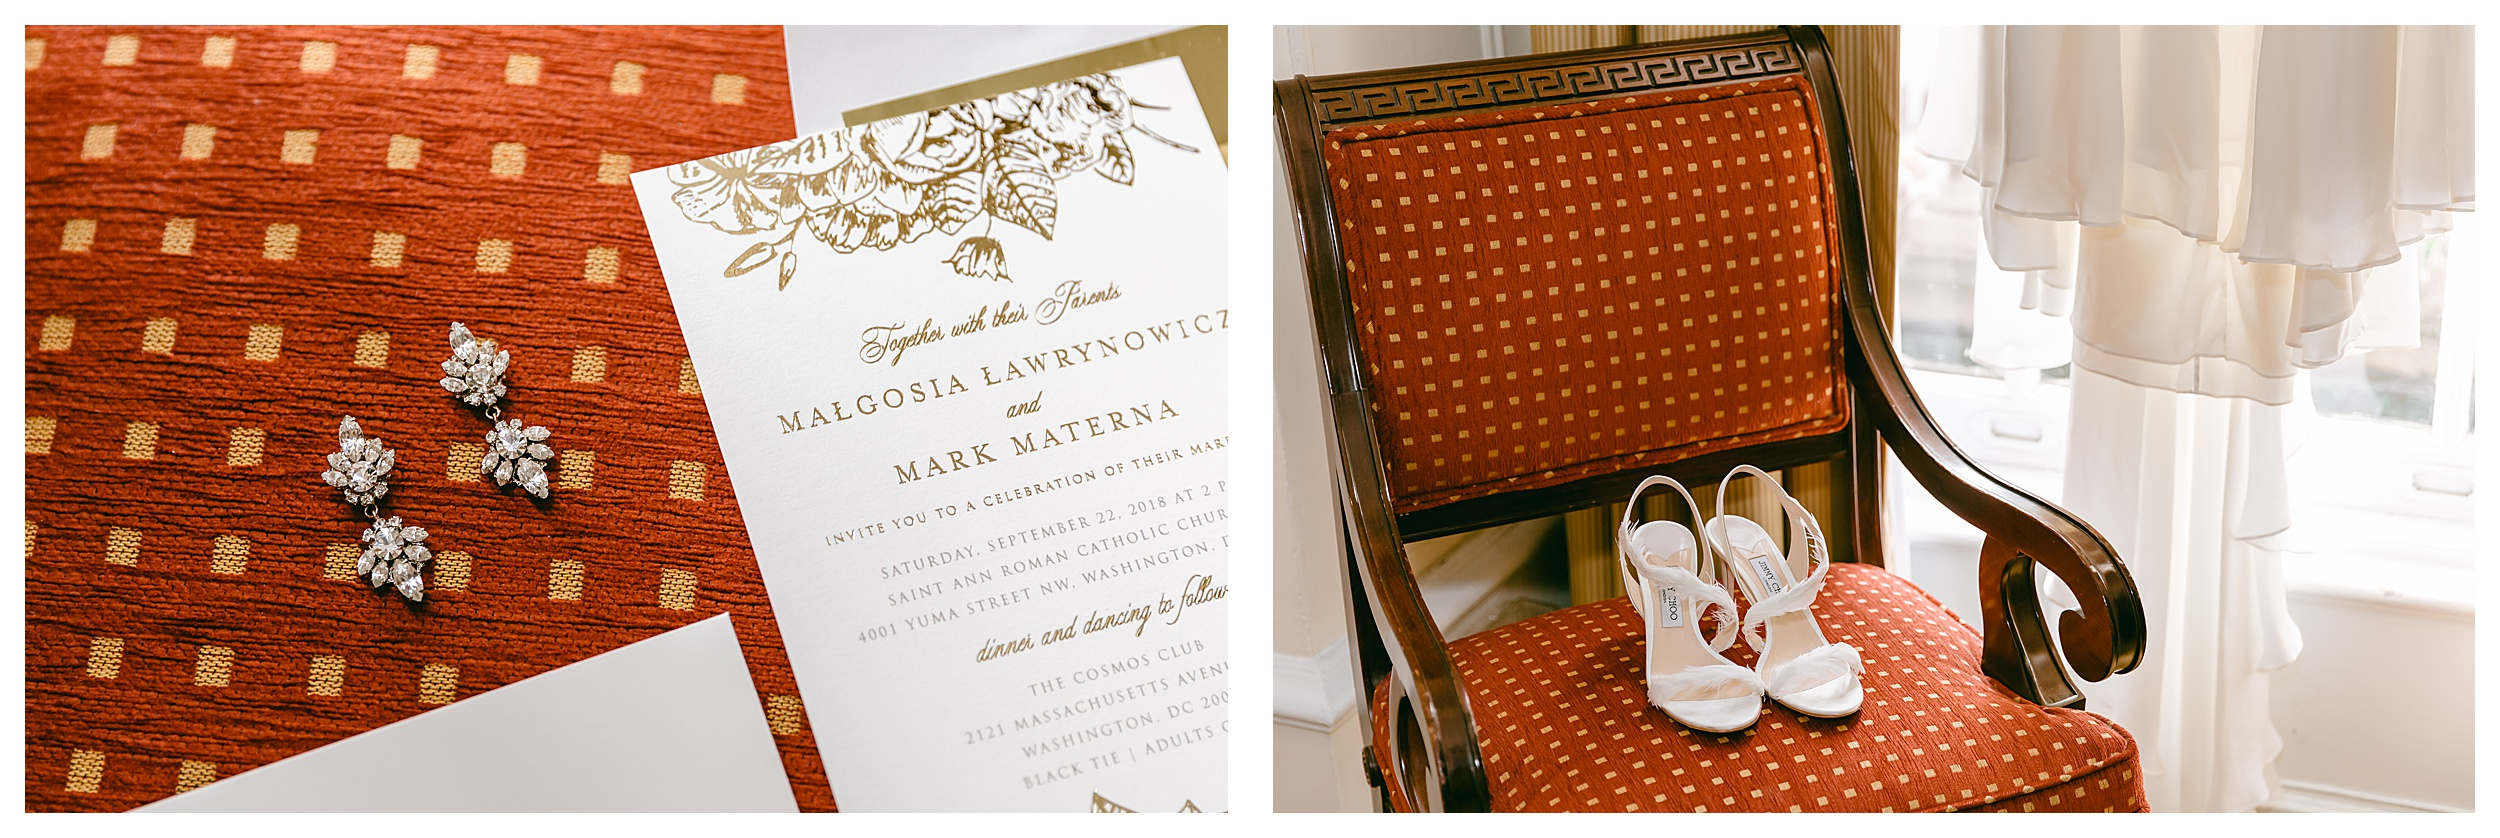 wedding invitations and jimmy choo shoes detail shots